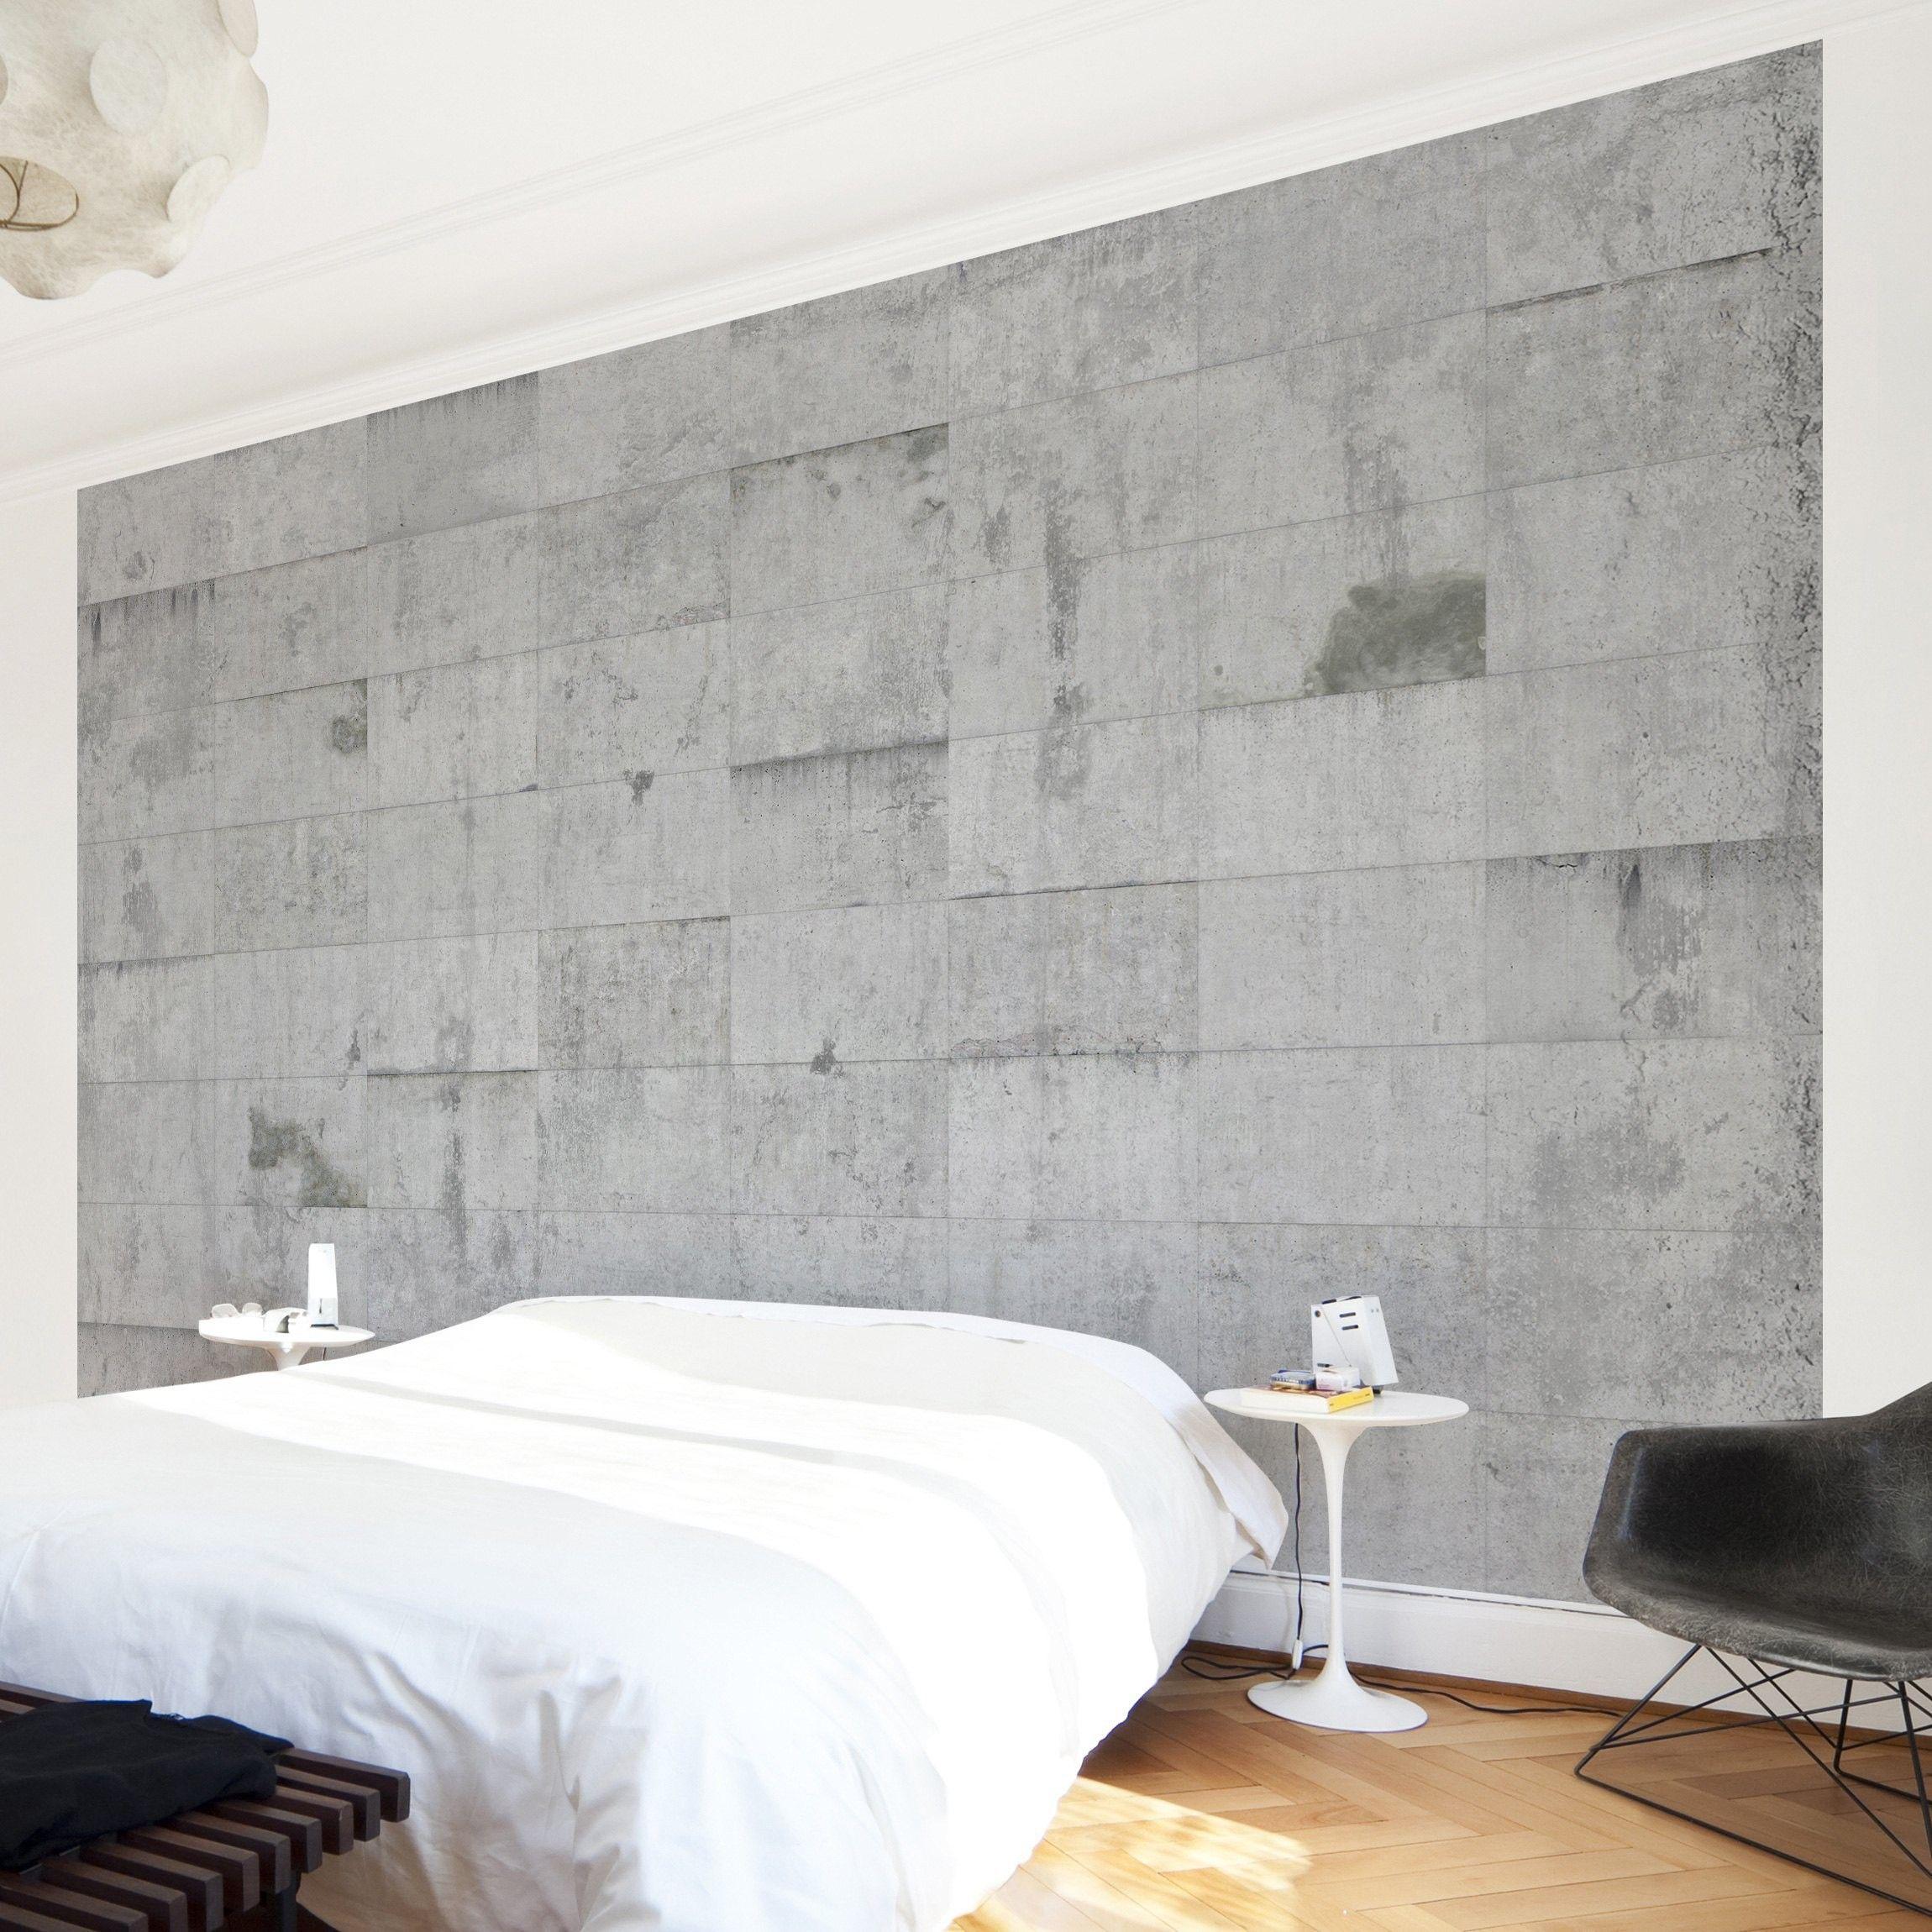 Tapete betonoptik beton ziegeloptik grau vliestapete for Wandtapete wohnzimmer